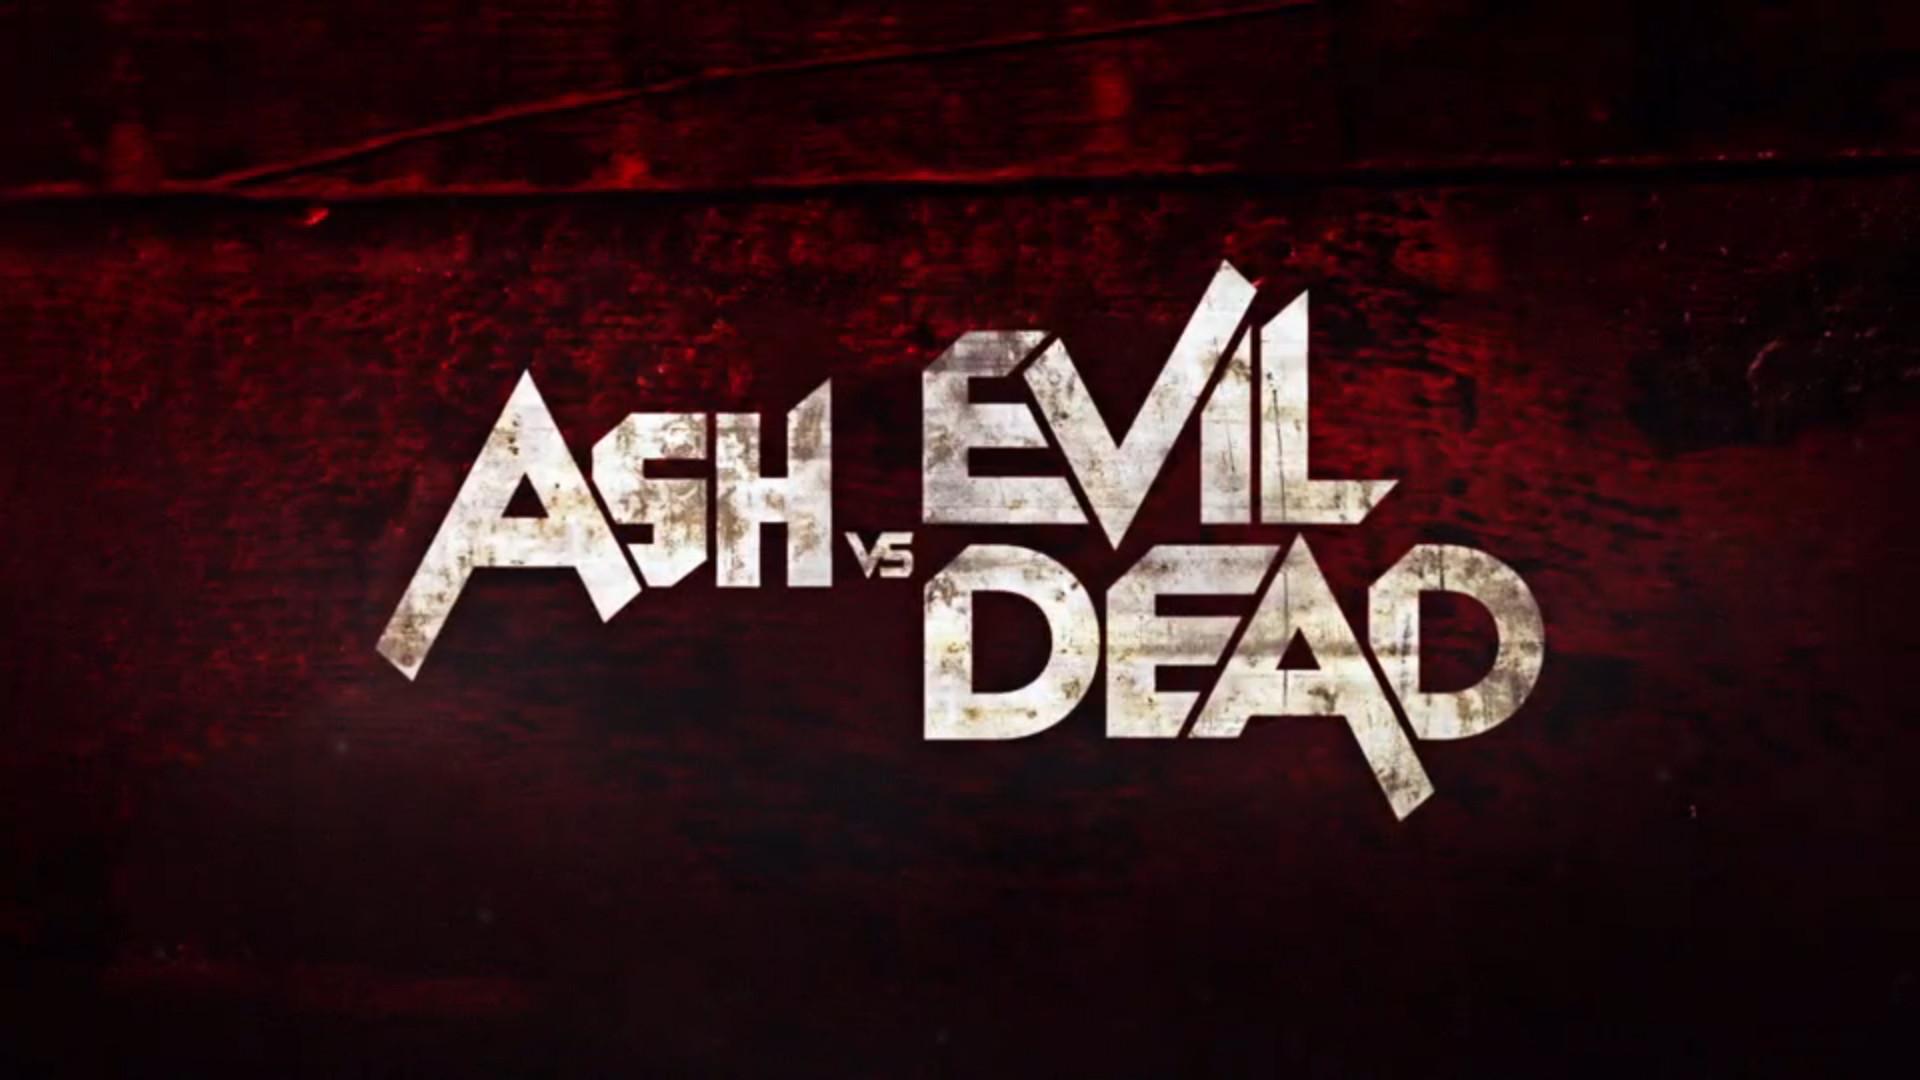 Res: 1920x1080, 100% Quality HD Evil Dead Images Collection for Desktop